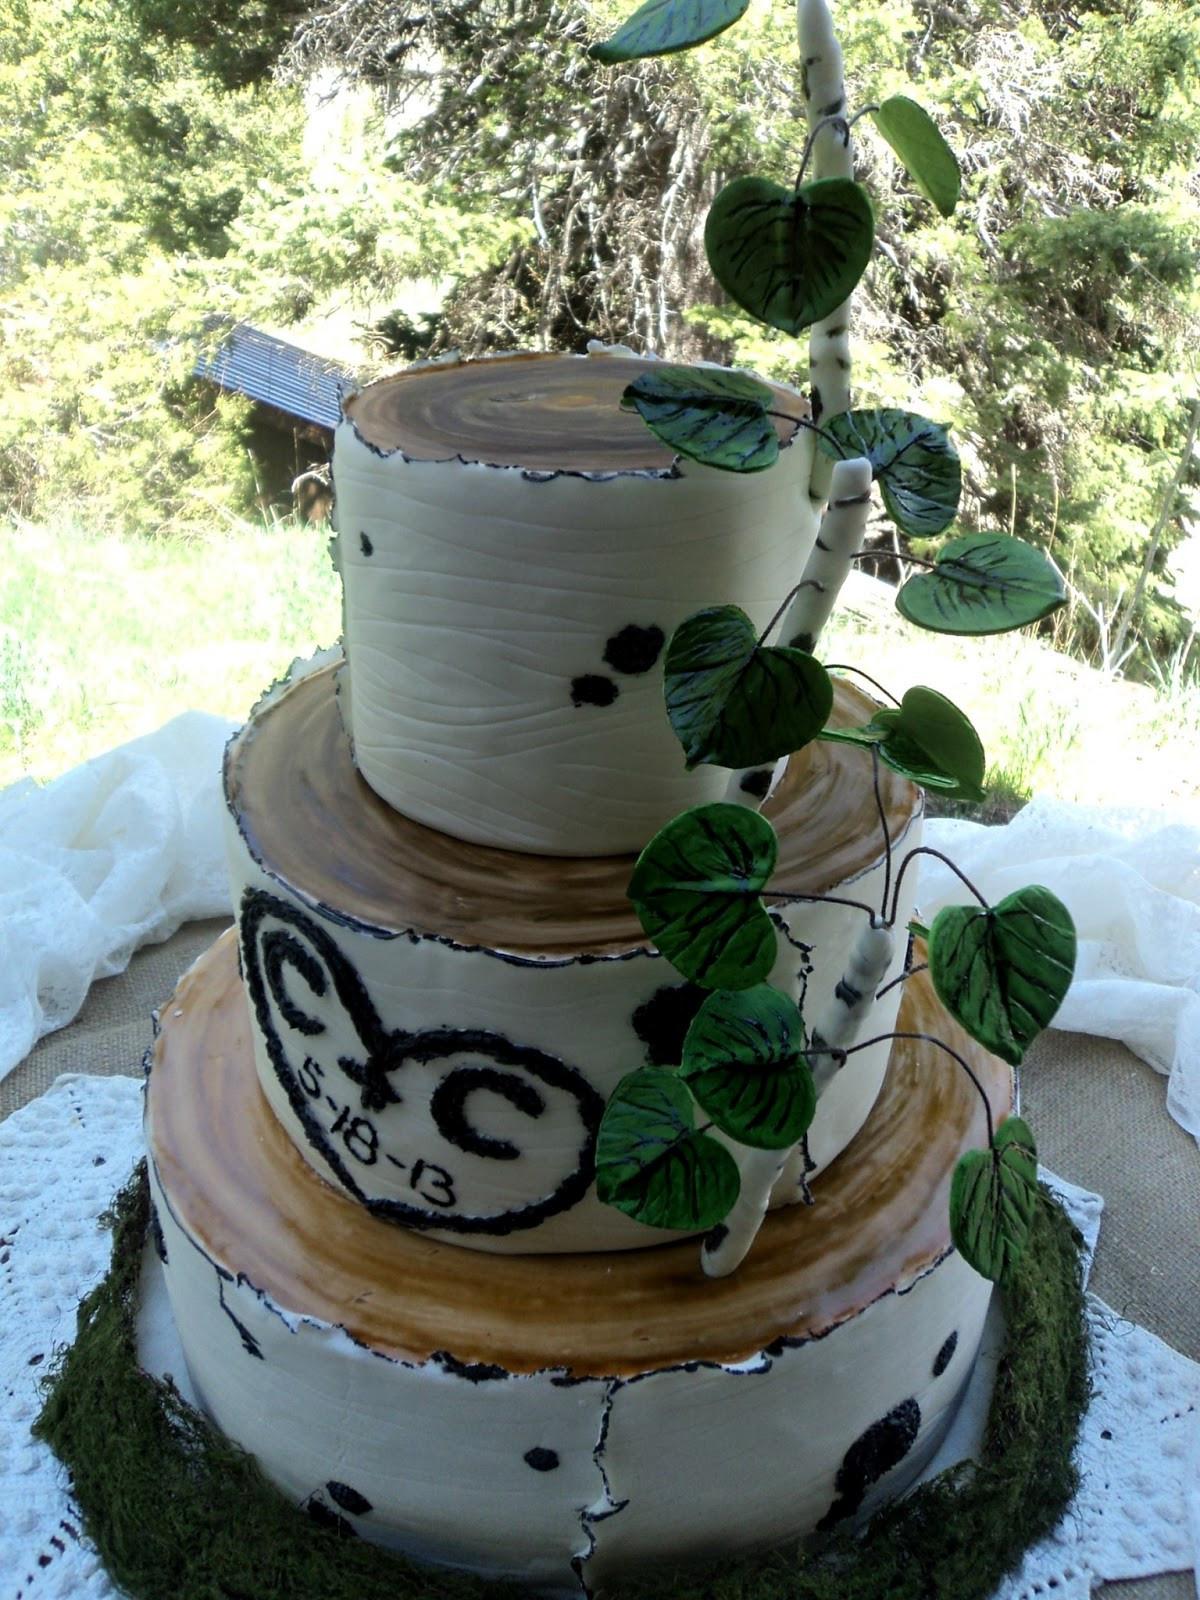 Aspen Tree Wedding Cakes  Delectable Cakes Aspen Tree Wedding Cake